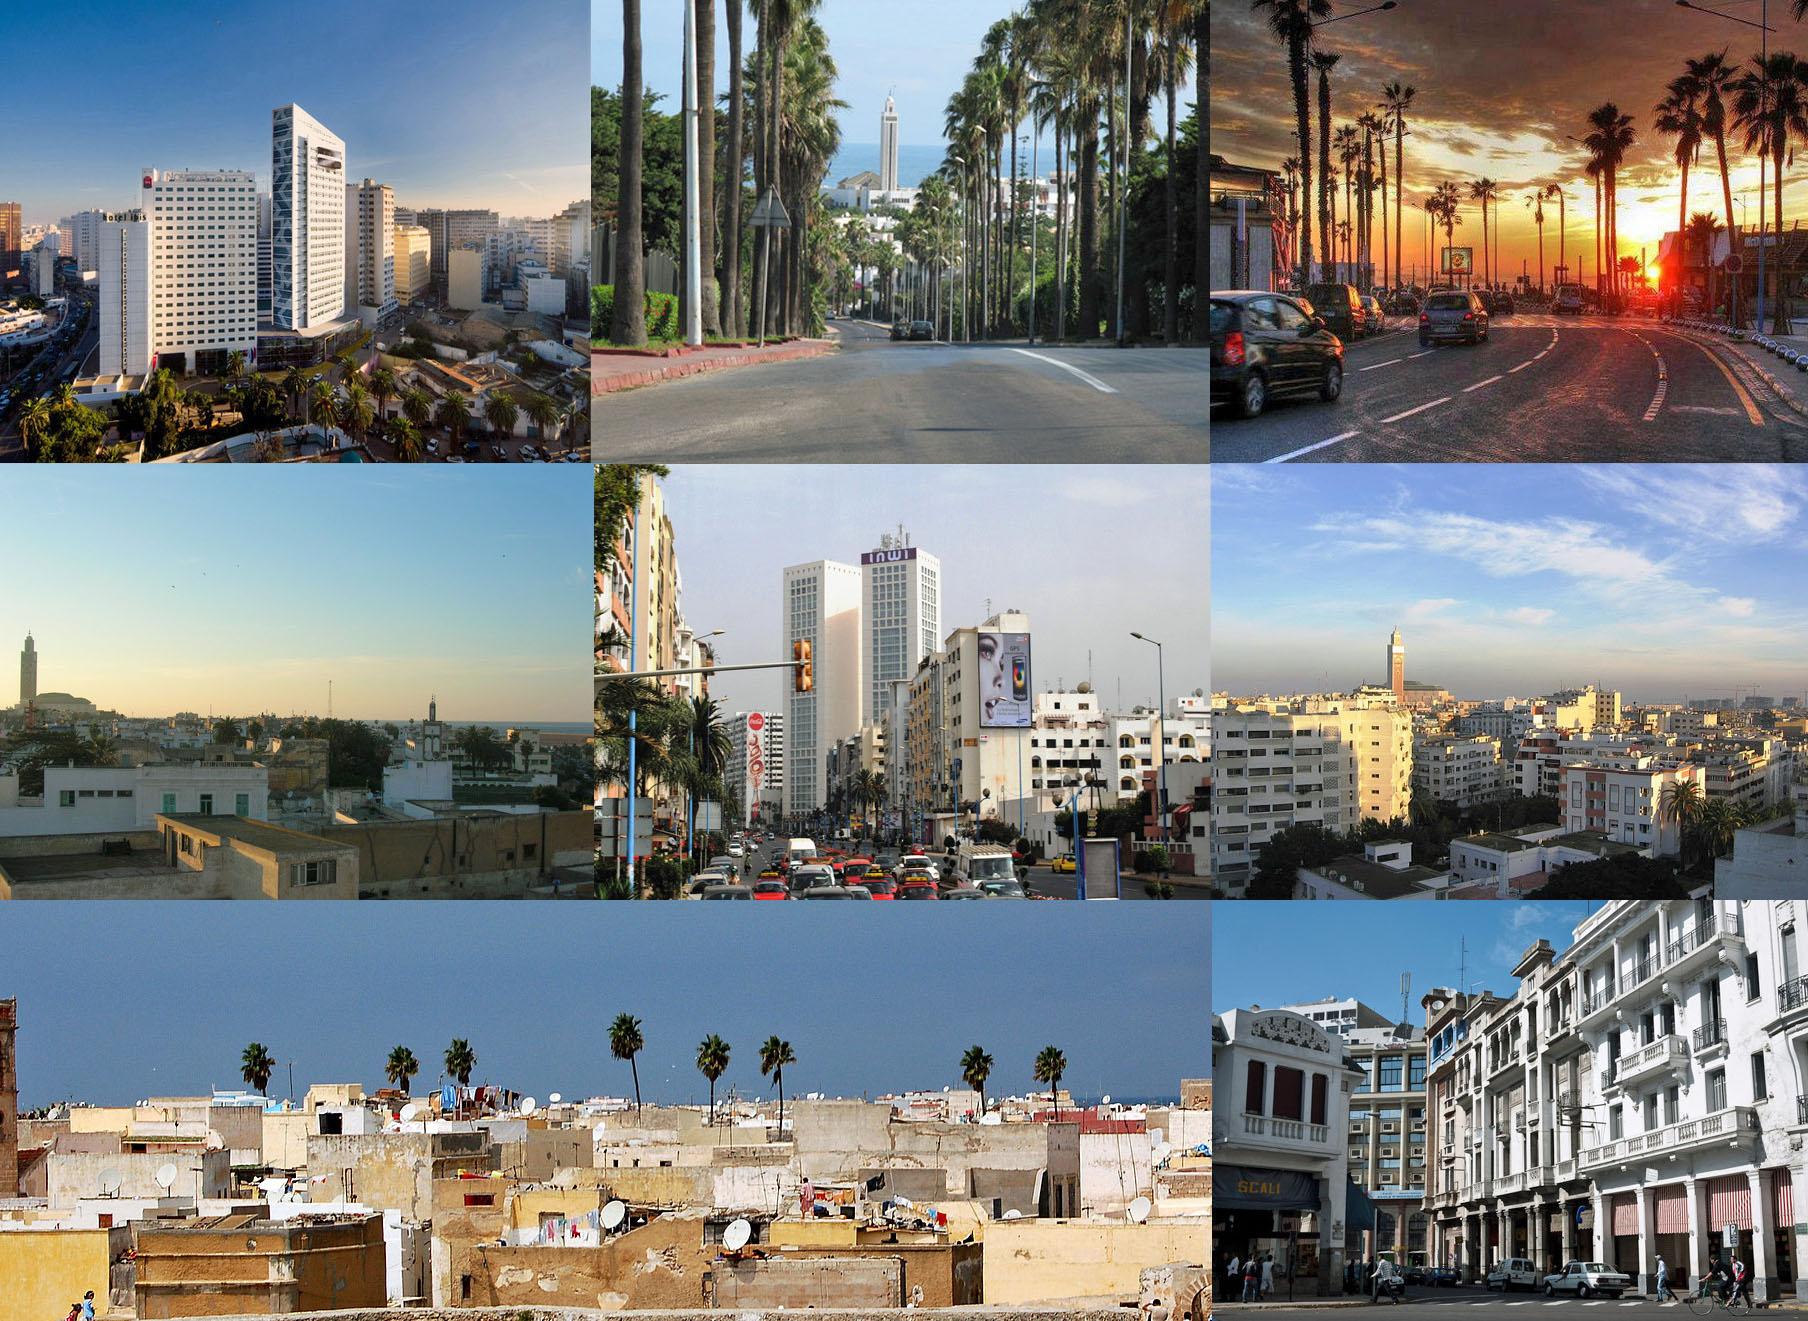 Casablanca (Marokkó) – Wikipédia